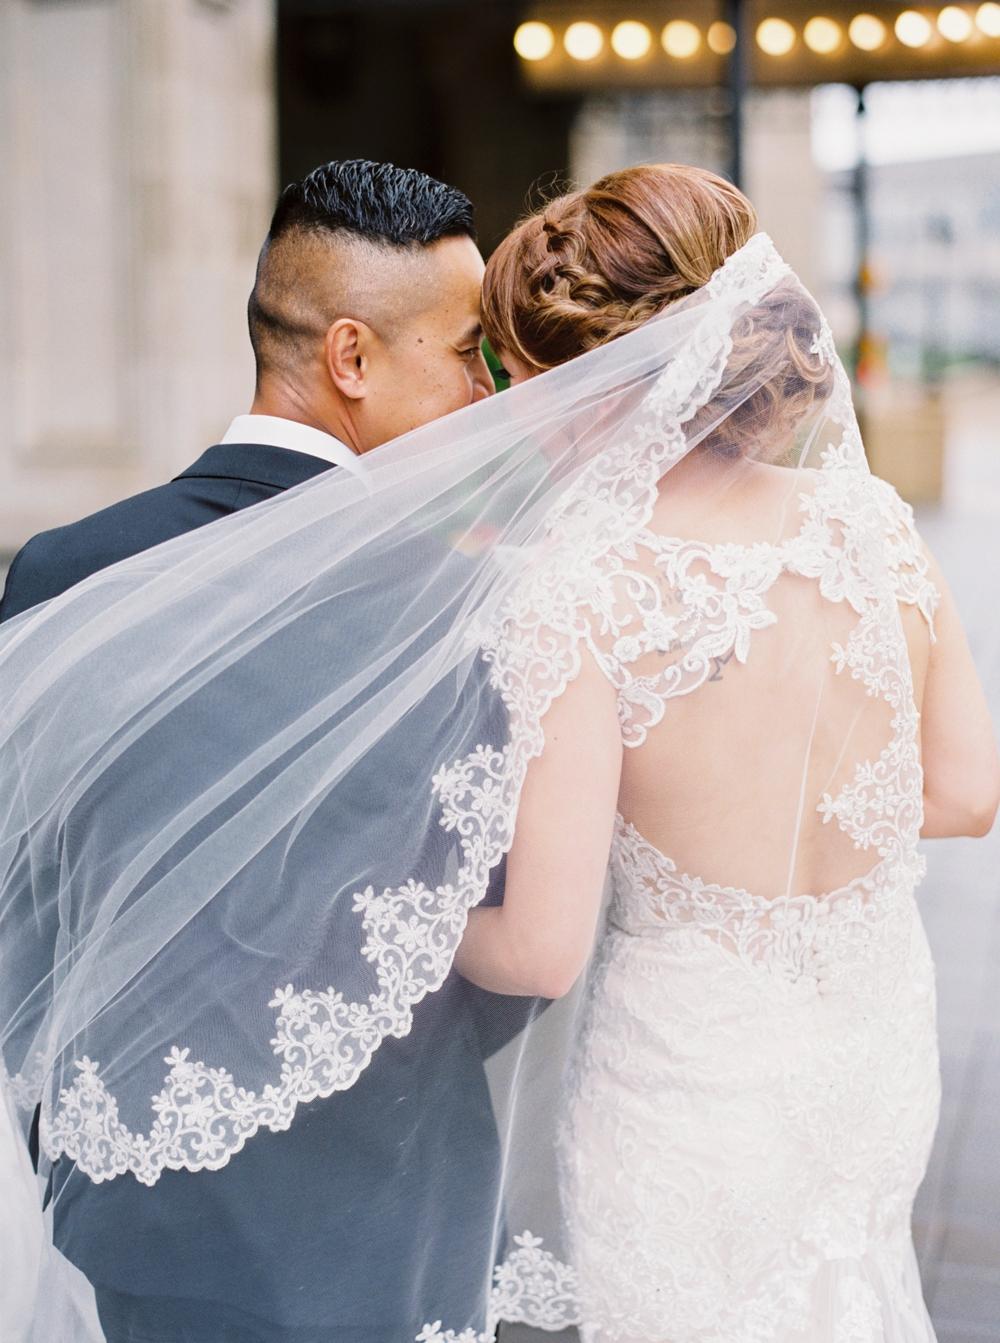 Calgary Wedding Photographer | Fairmont Hotel Macdonald Wedding | J'adore Weddings & Events Design | Edmonton Photography | Fine Art Film Wedding Photographer